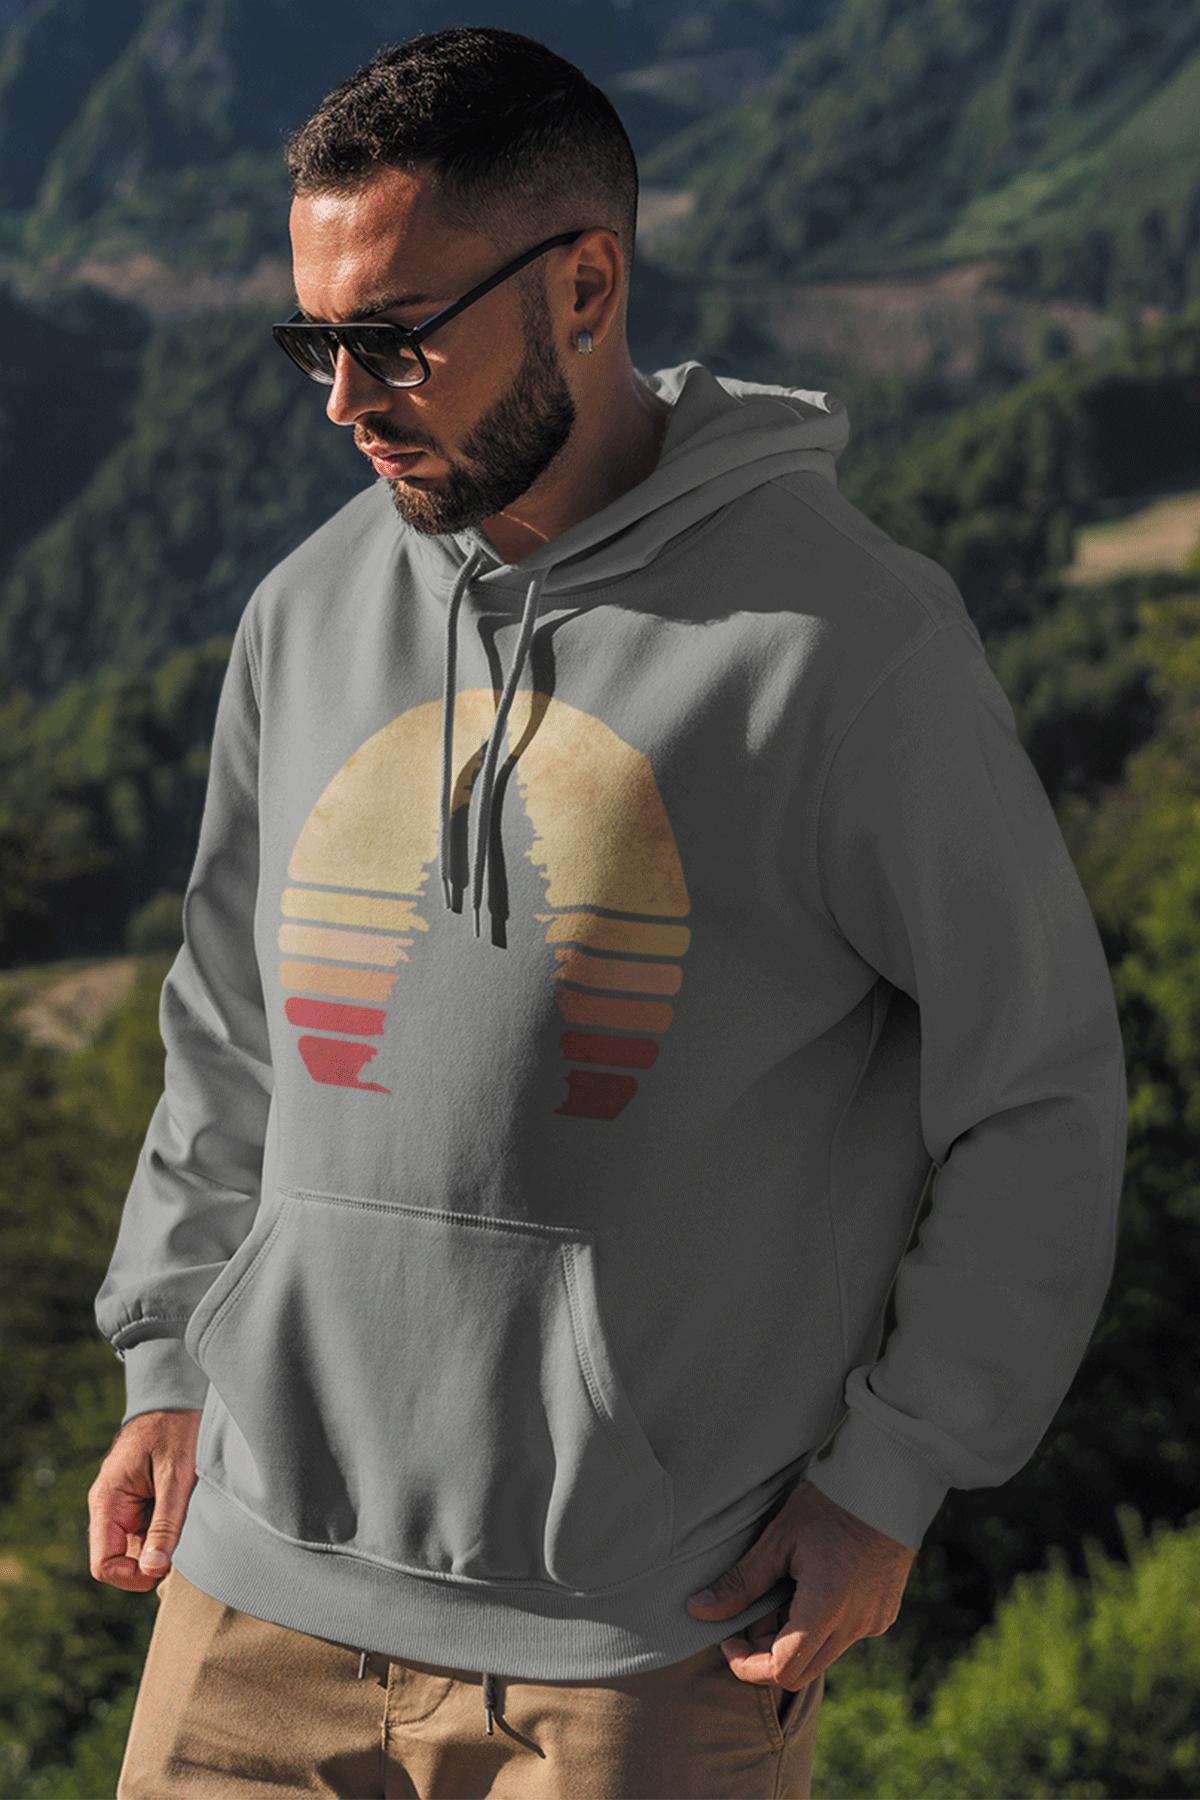 Sunset Gri Erkek Kapşonlu Sweatshirt - Hoodie